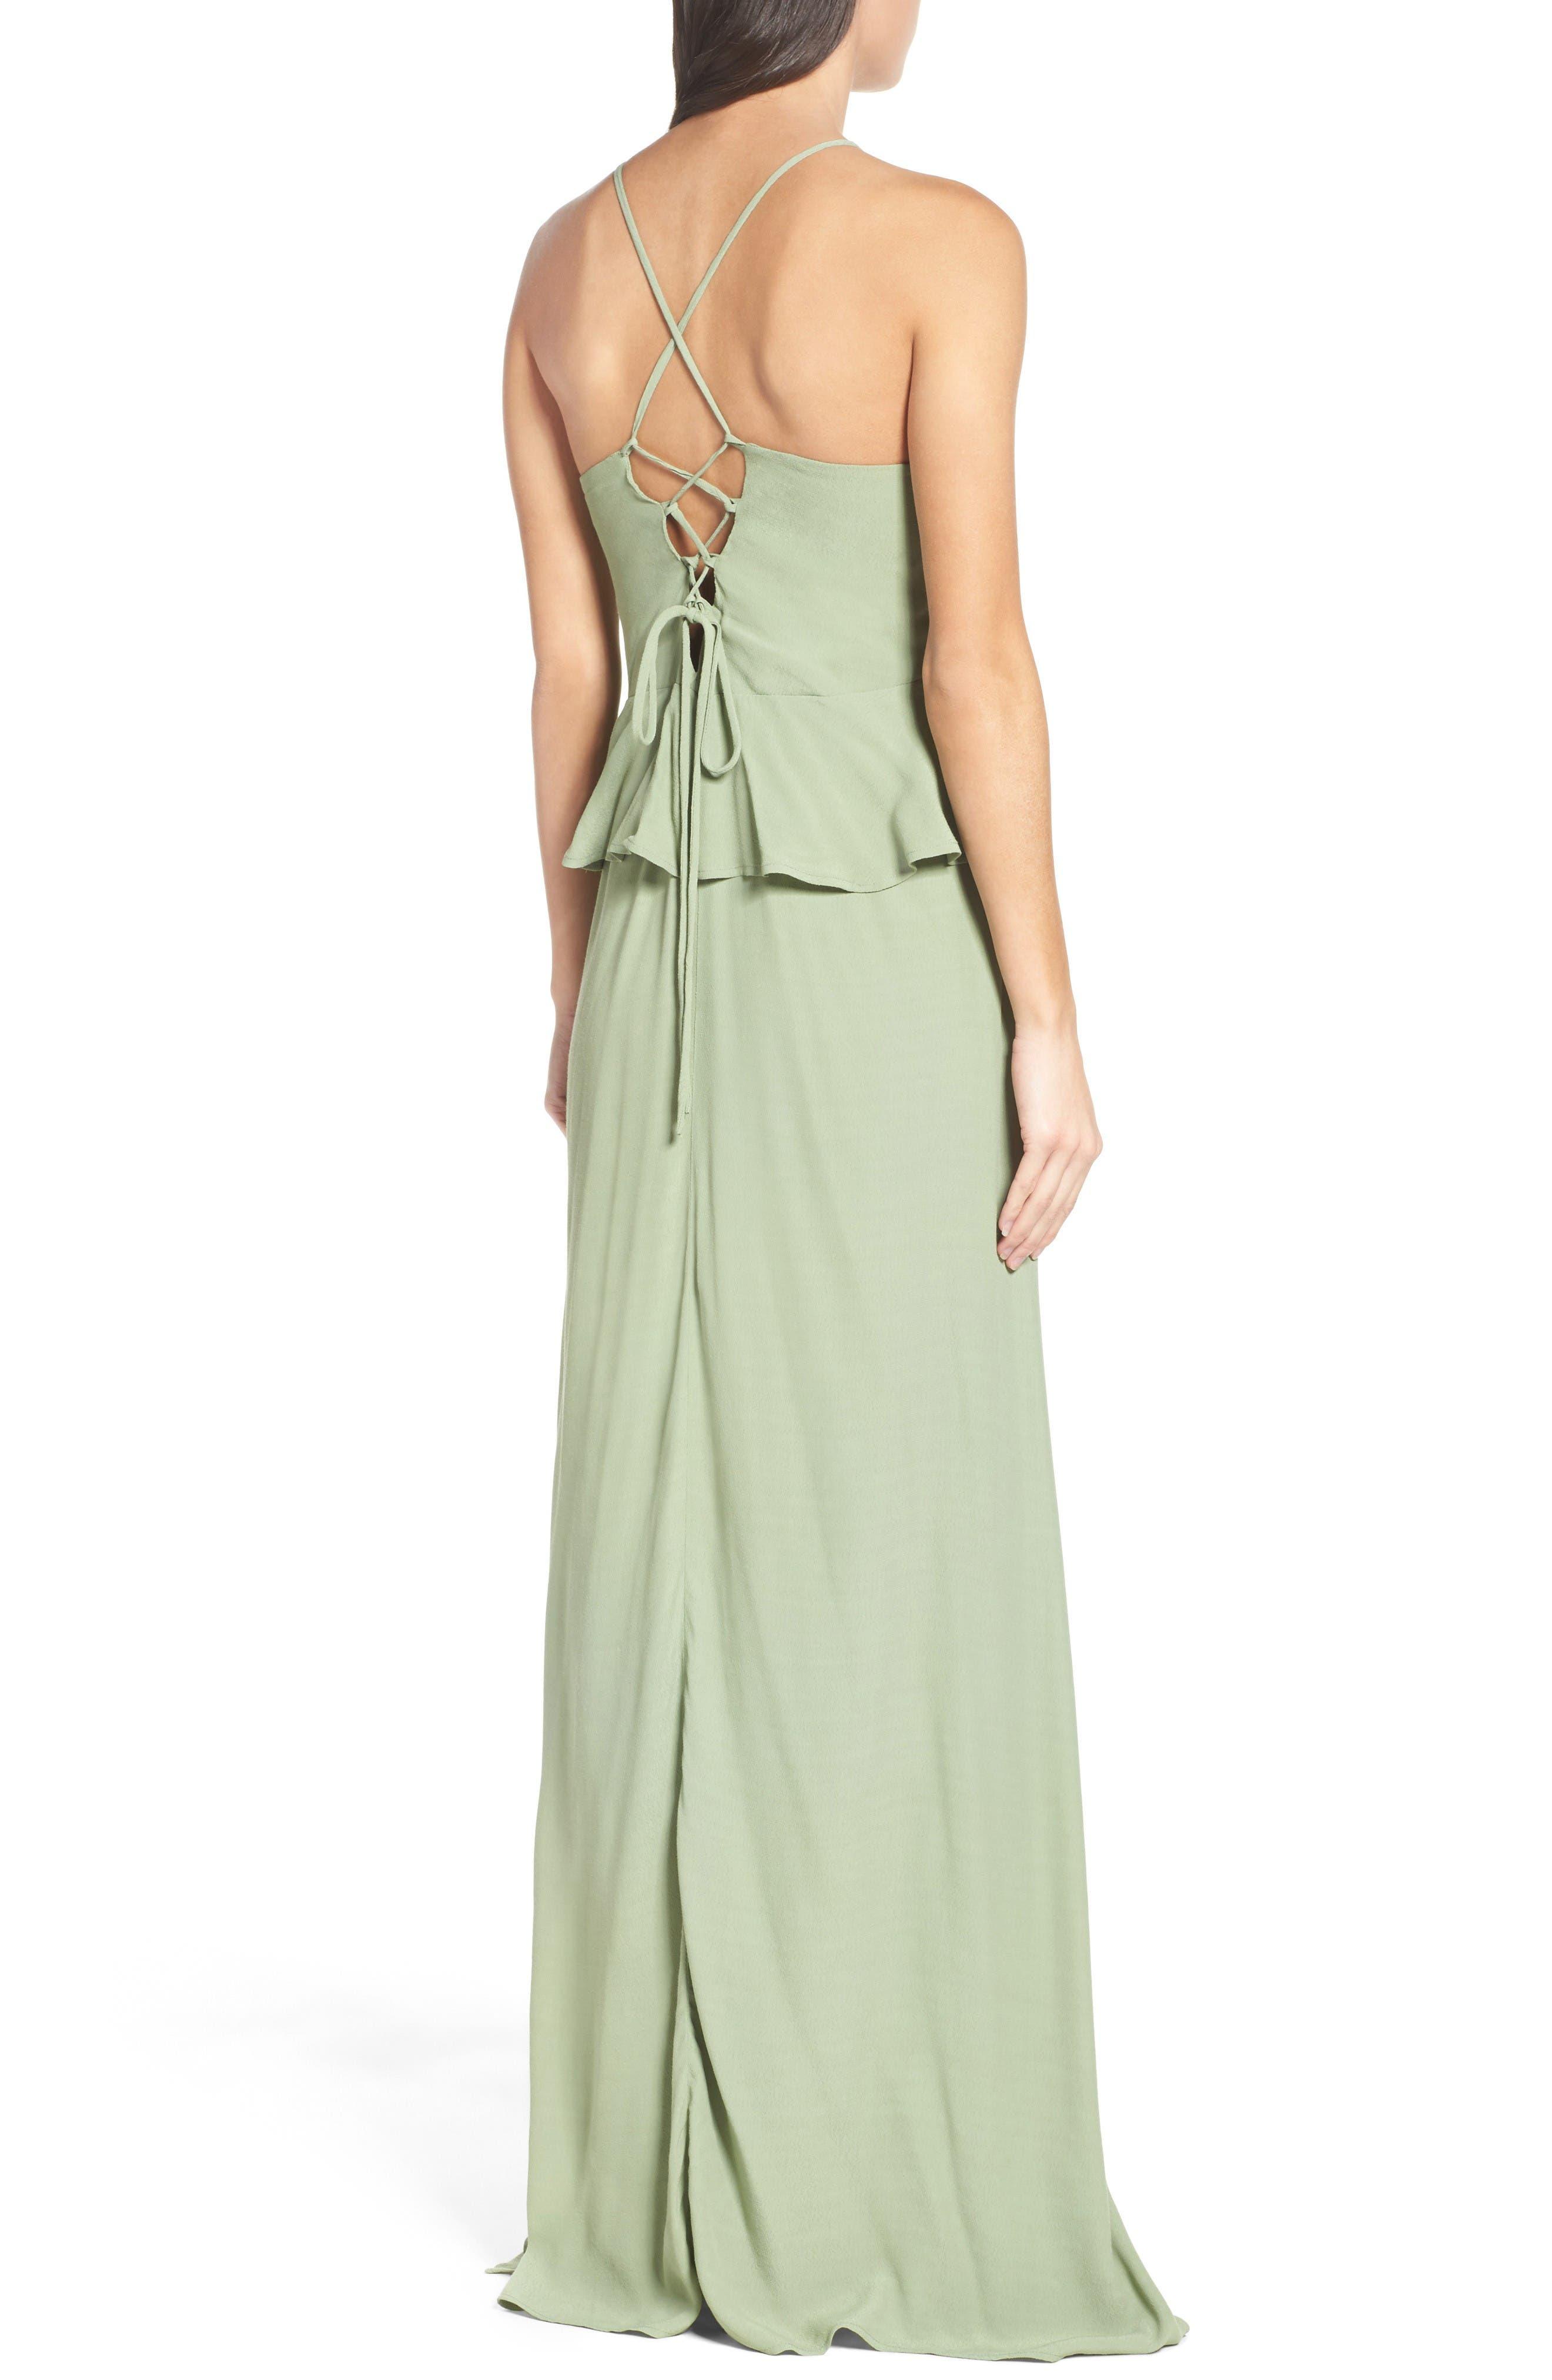 Alternate Image 2  - Roe + May Jolie Crepe Peplum Dress